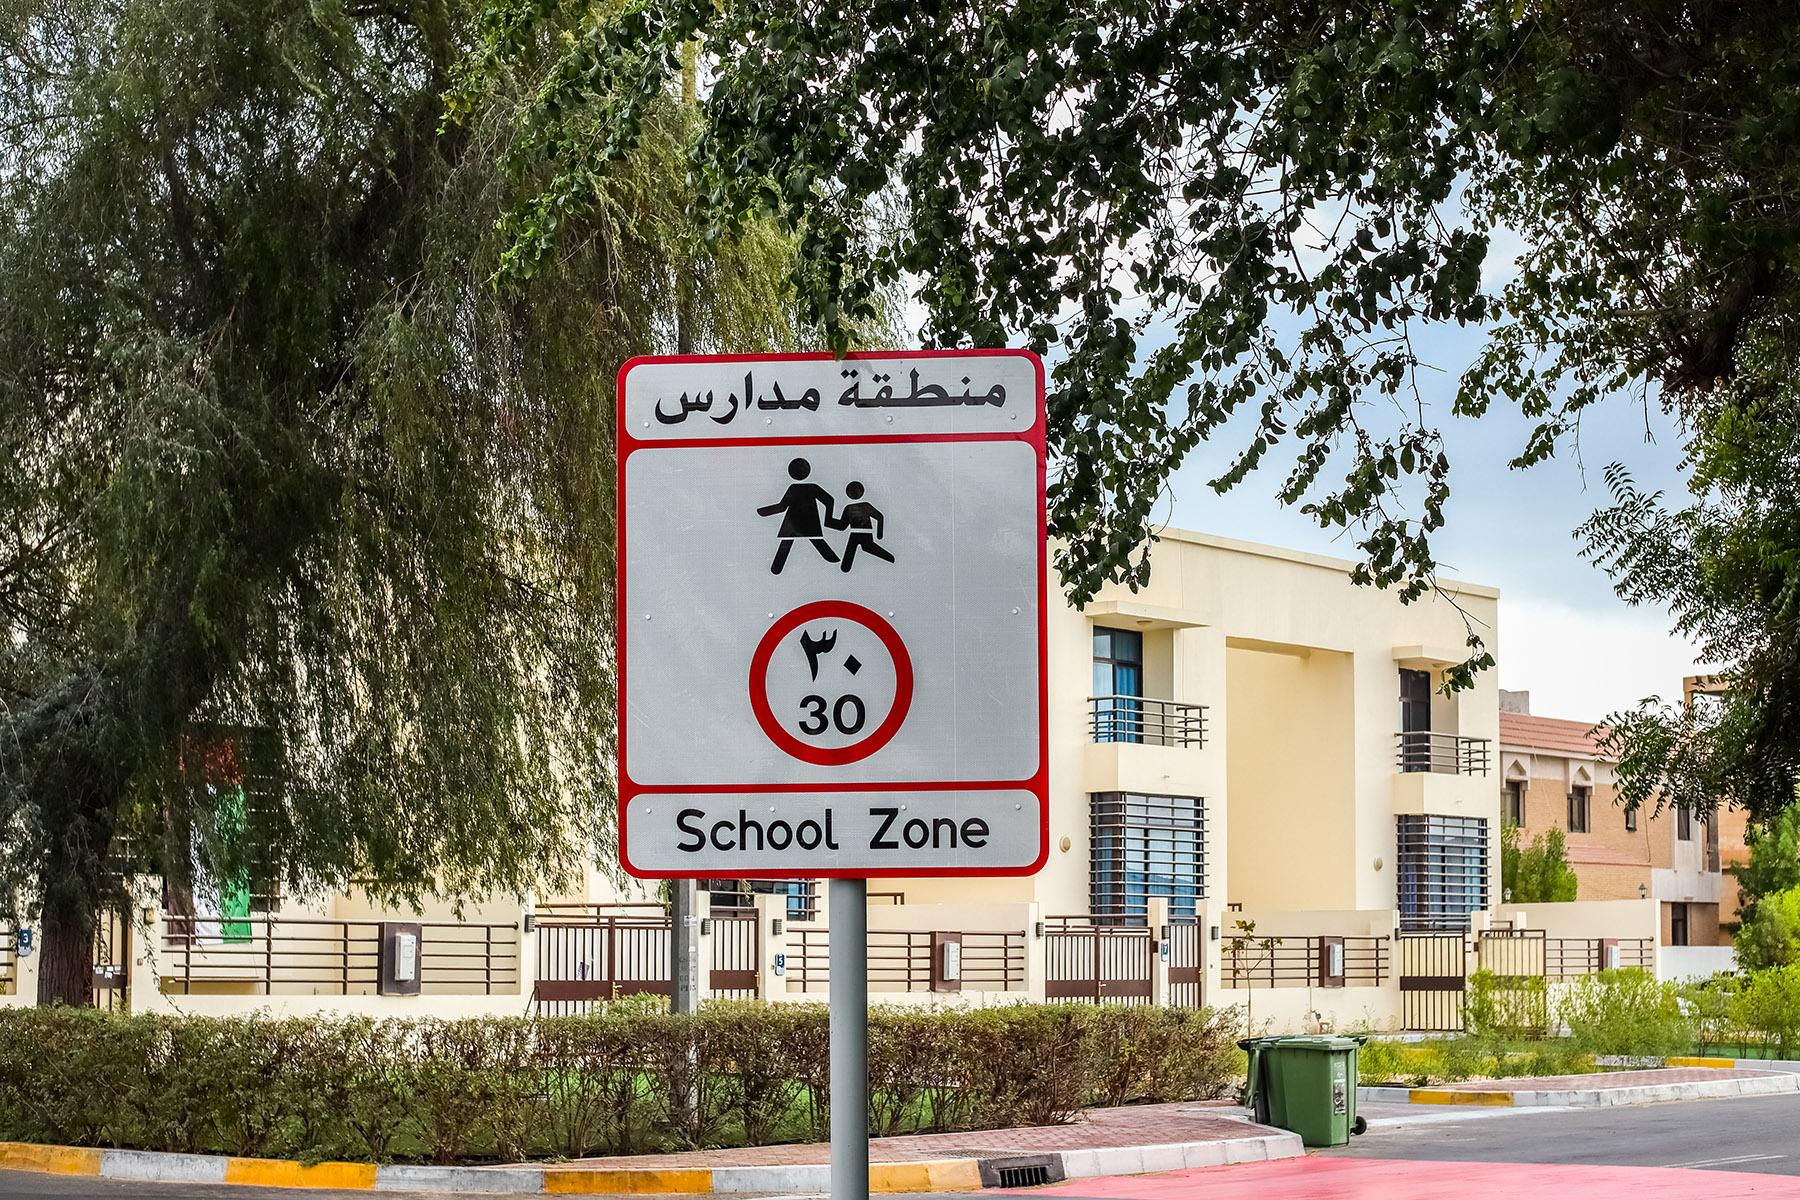 School zone in Abu Dhabi